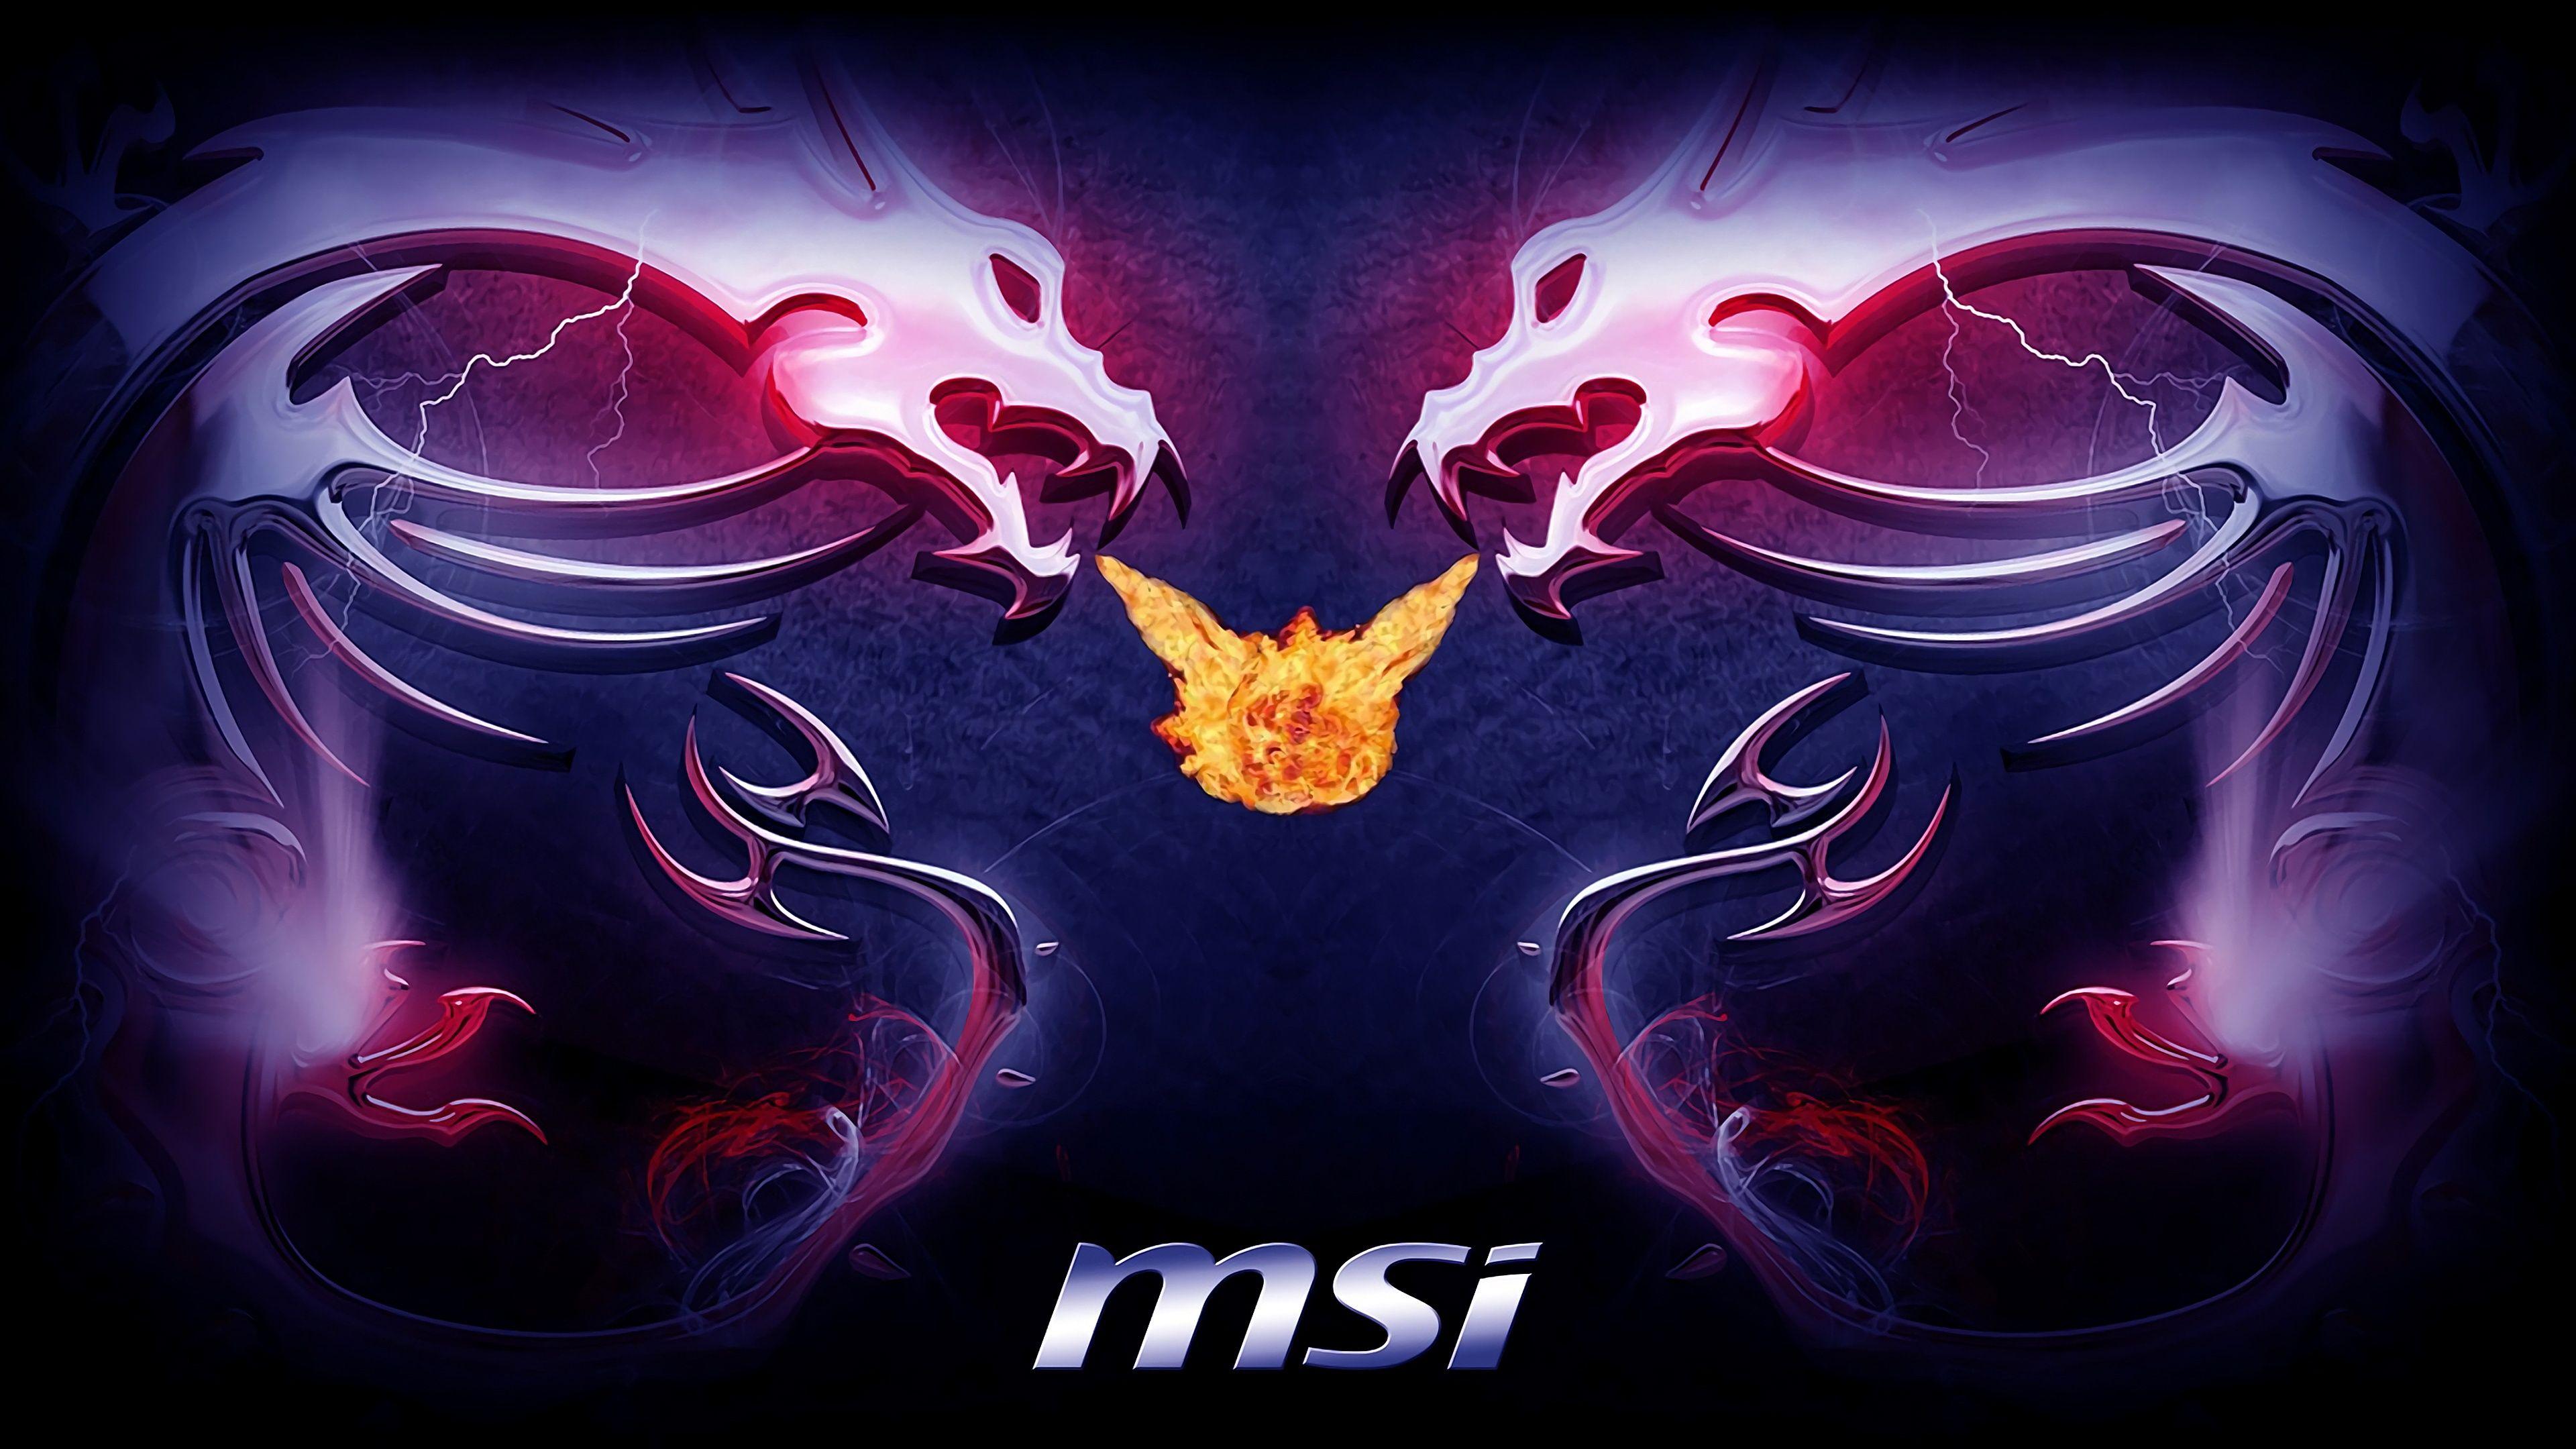 Msi Desktop Background Posted By Zoey Peltier